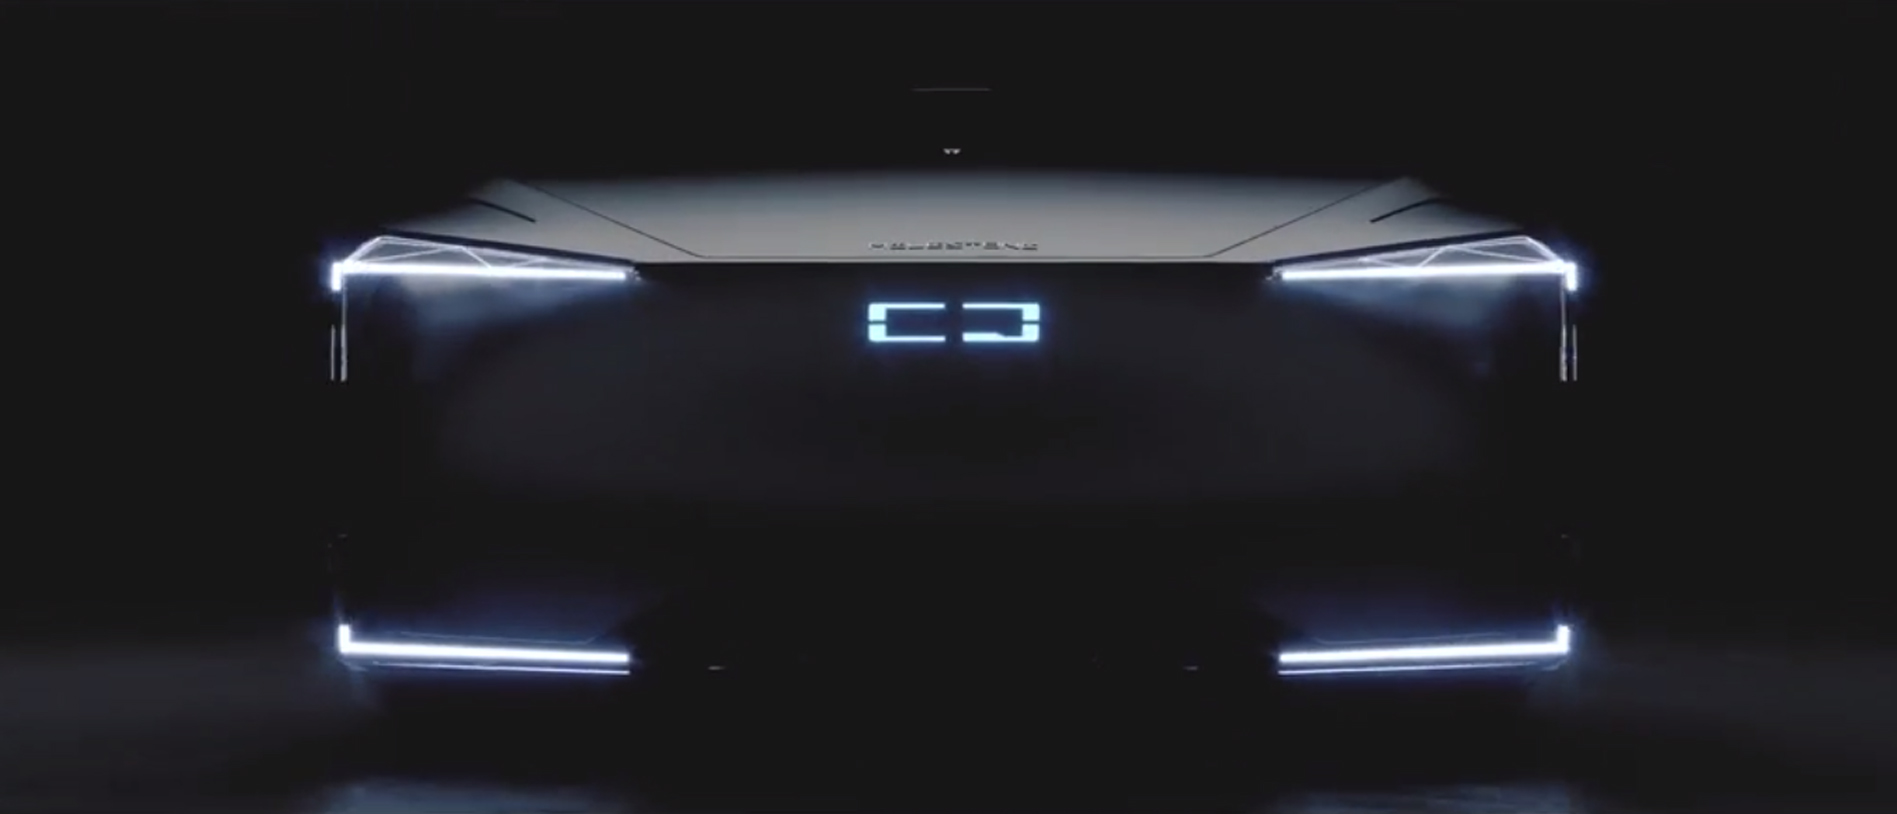 Z世代新车型 观致发布Milestone概念车预告图